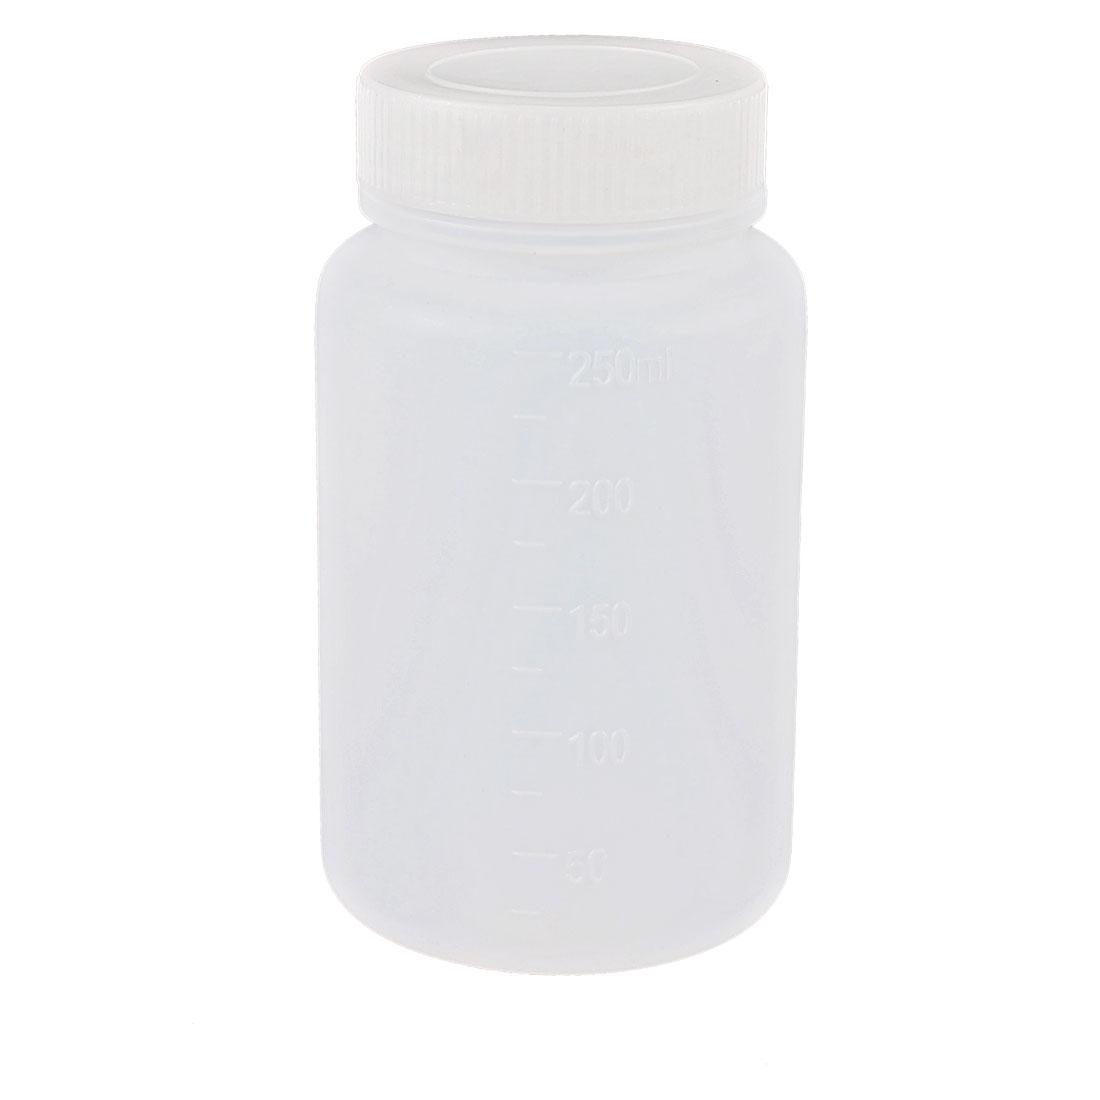 250mL Capacity Laboratory Storage Plastic Widemouth Bottle White